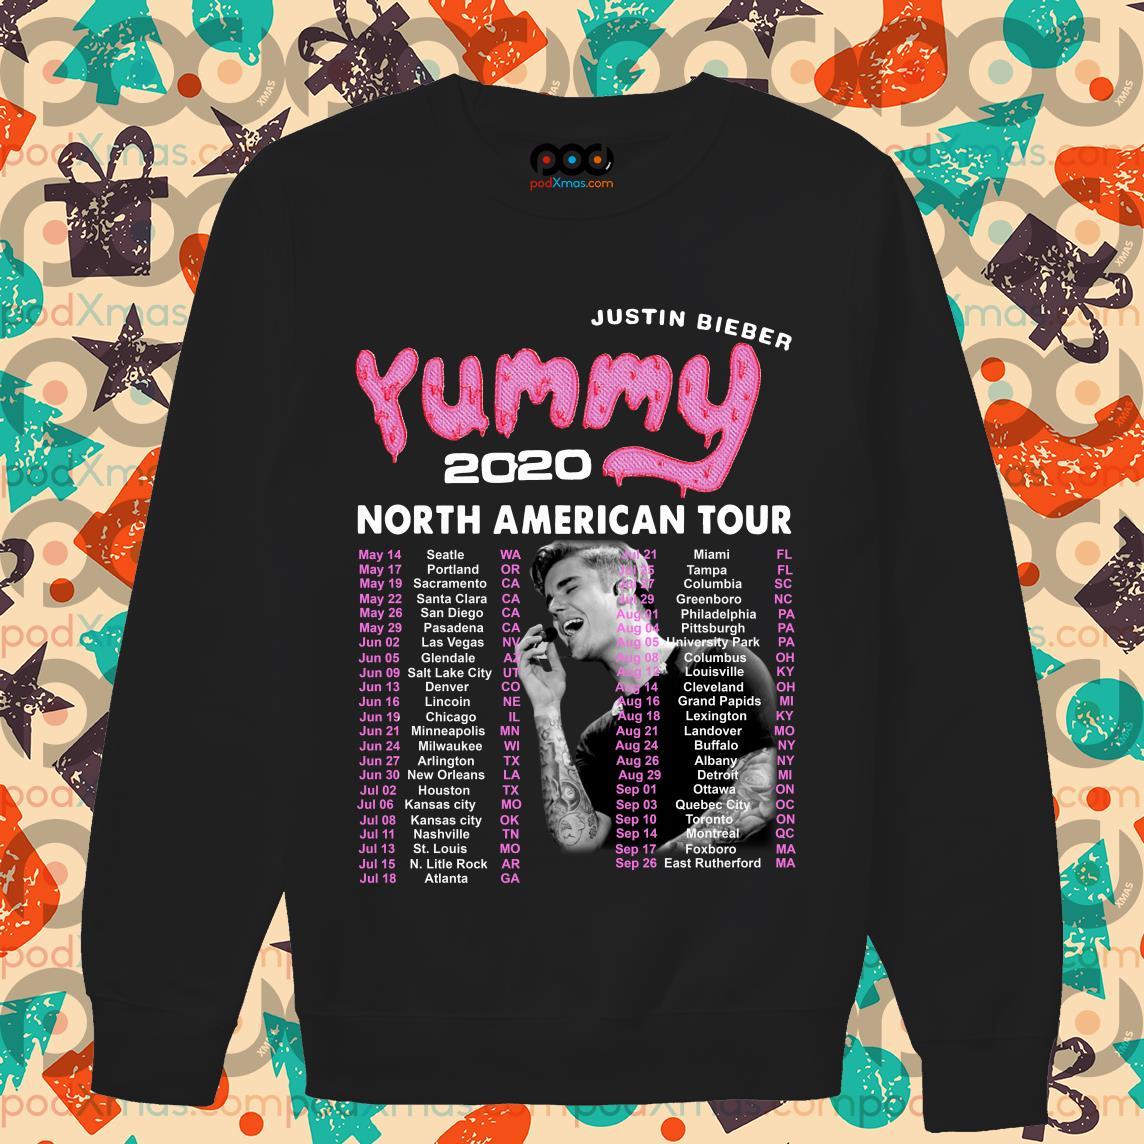 Justin Bieber Yummy 2020 North American Tour sweater